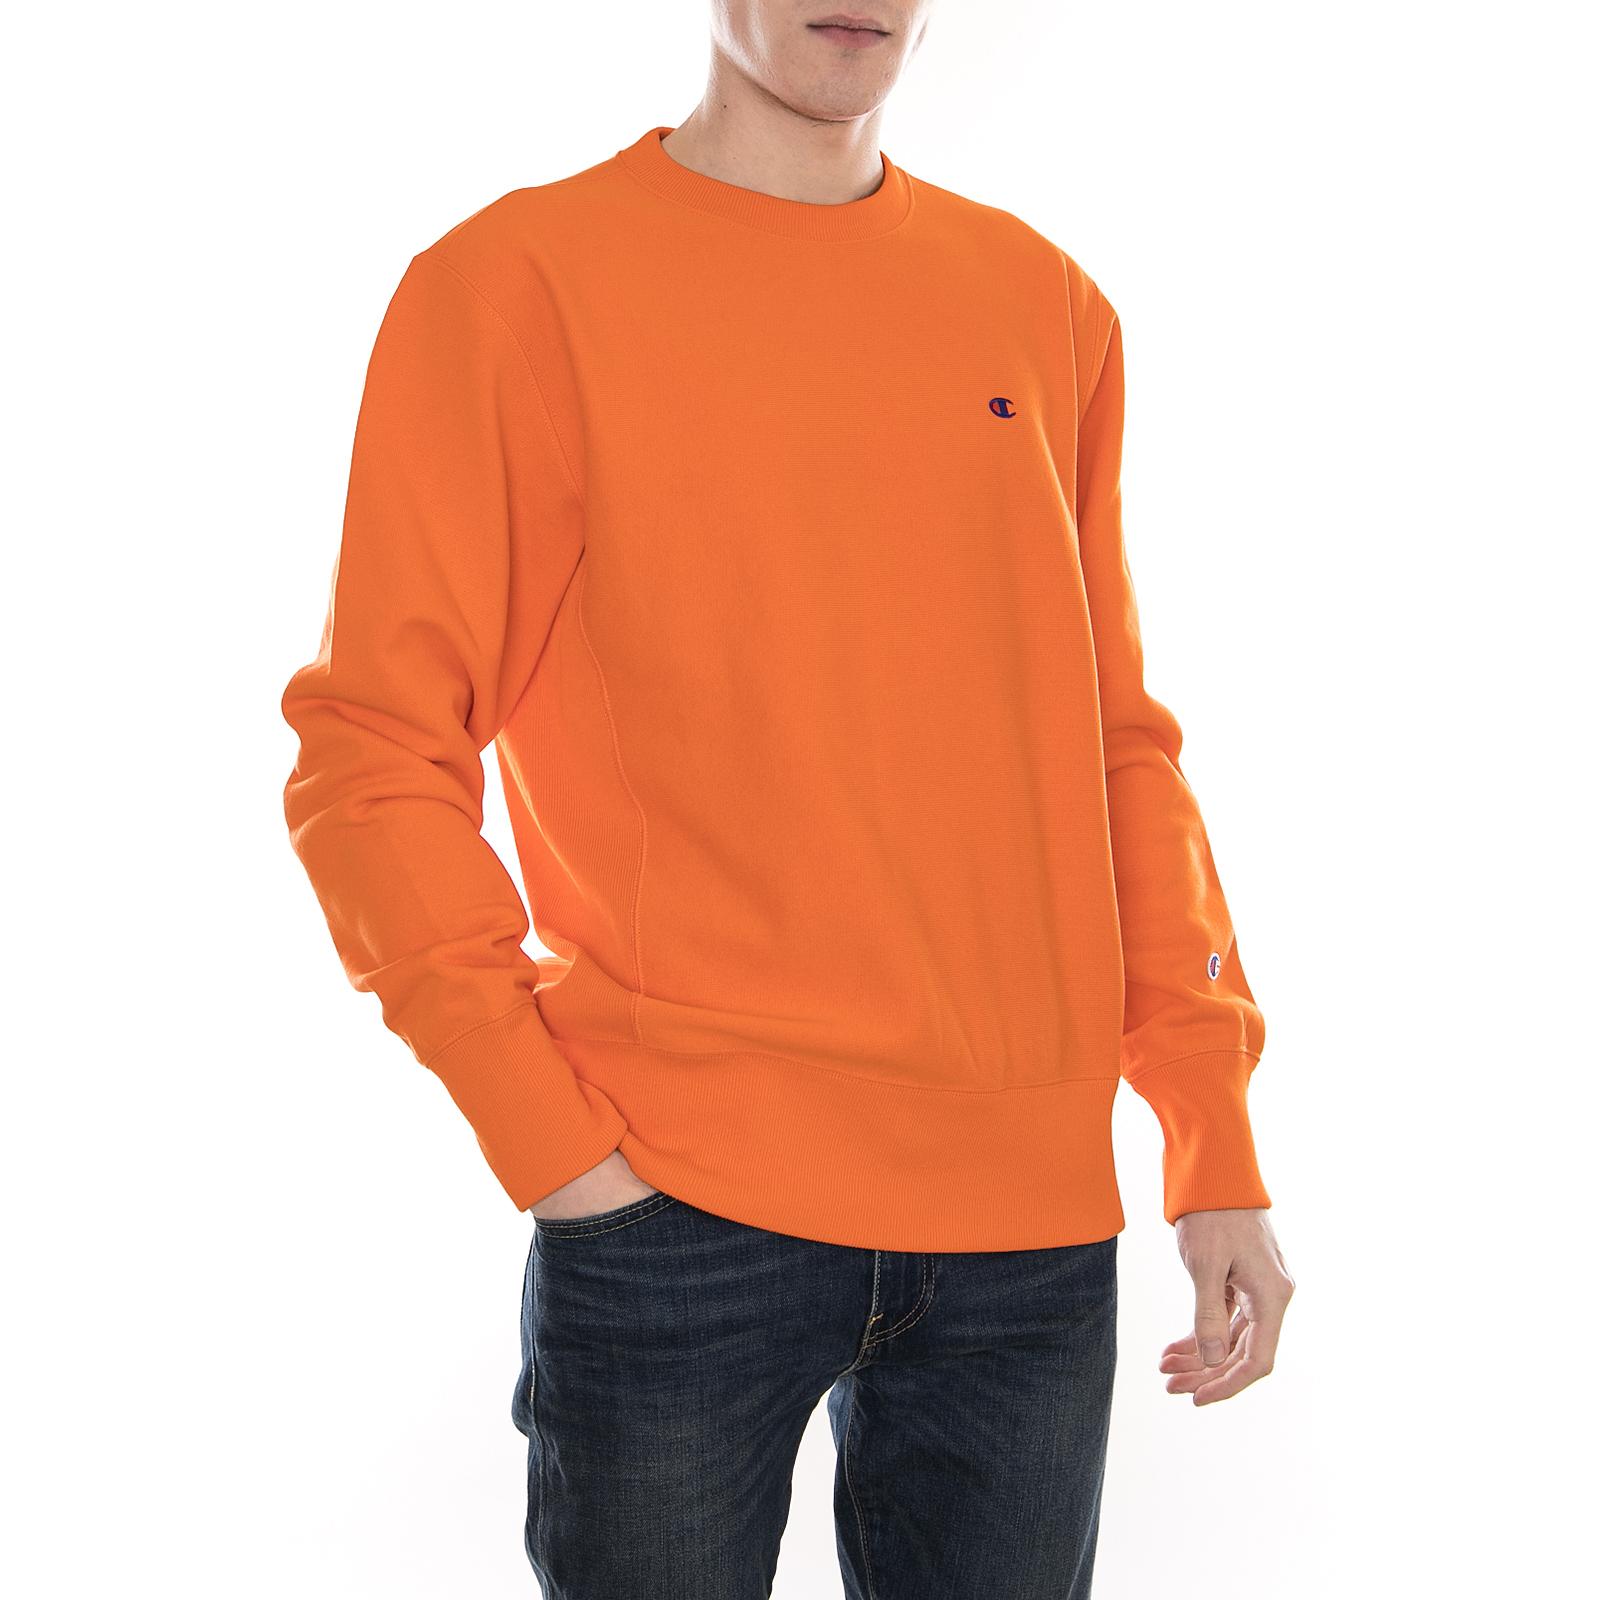 Champion Felpe Crewneck Sweatshirt Org Arancione